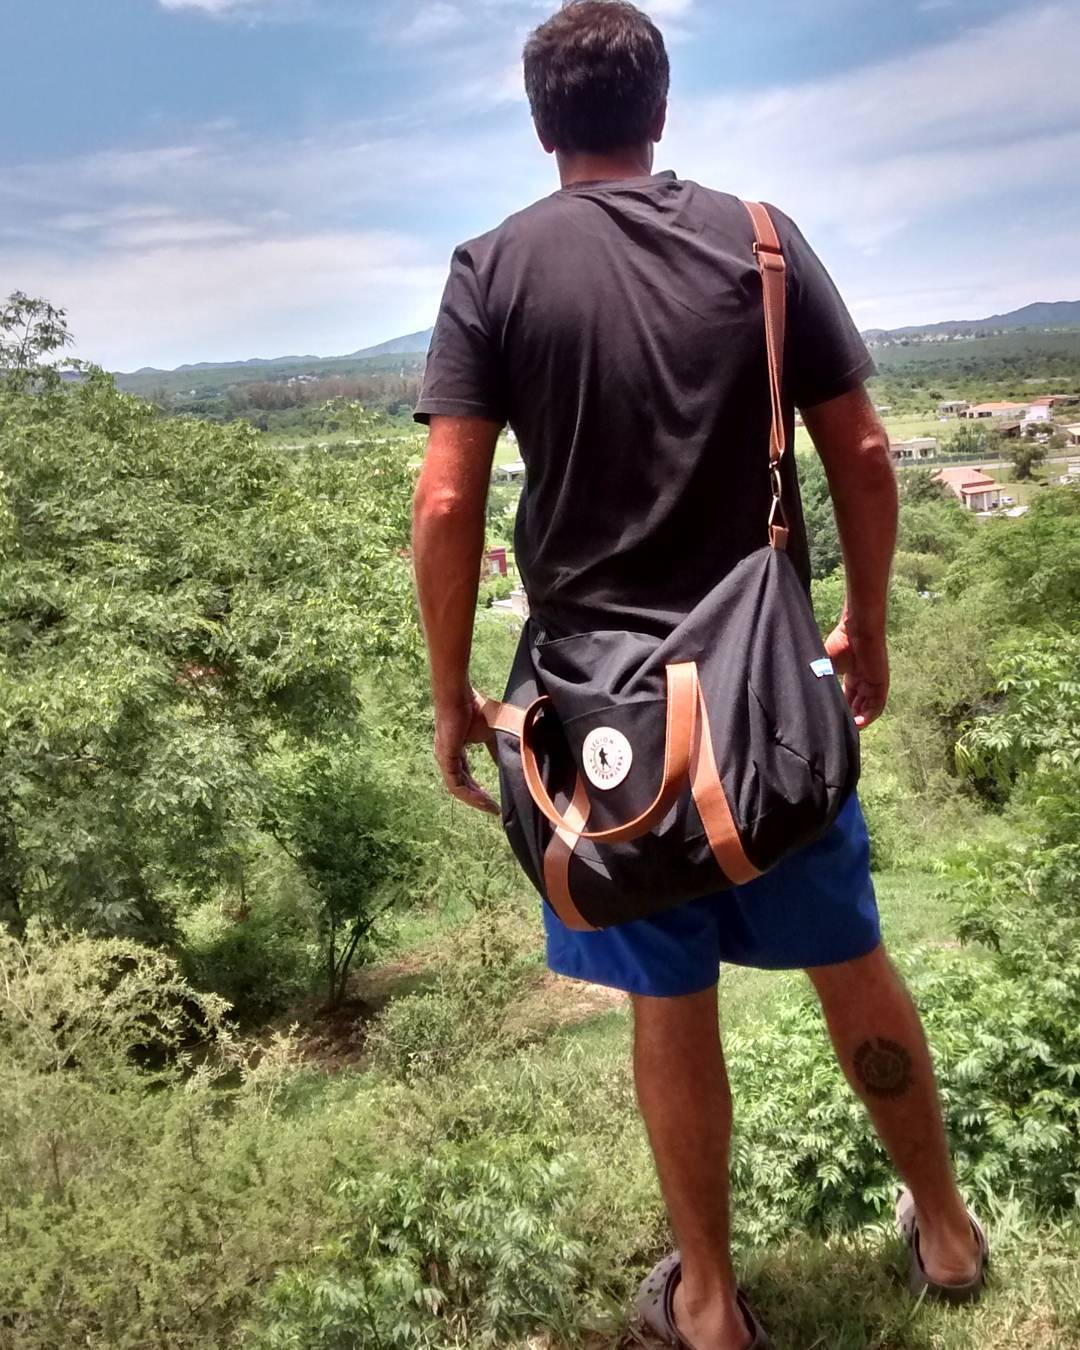 Stand tall #BubbaBag @yaca12 SHOP ONLINE www.legionextranjera.com.ar